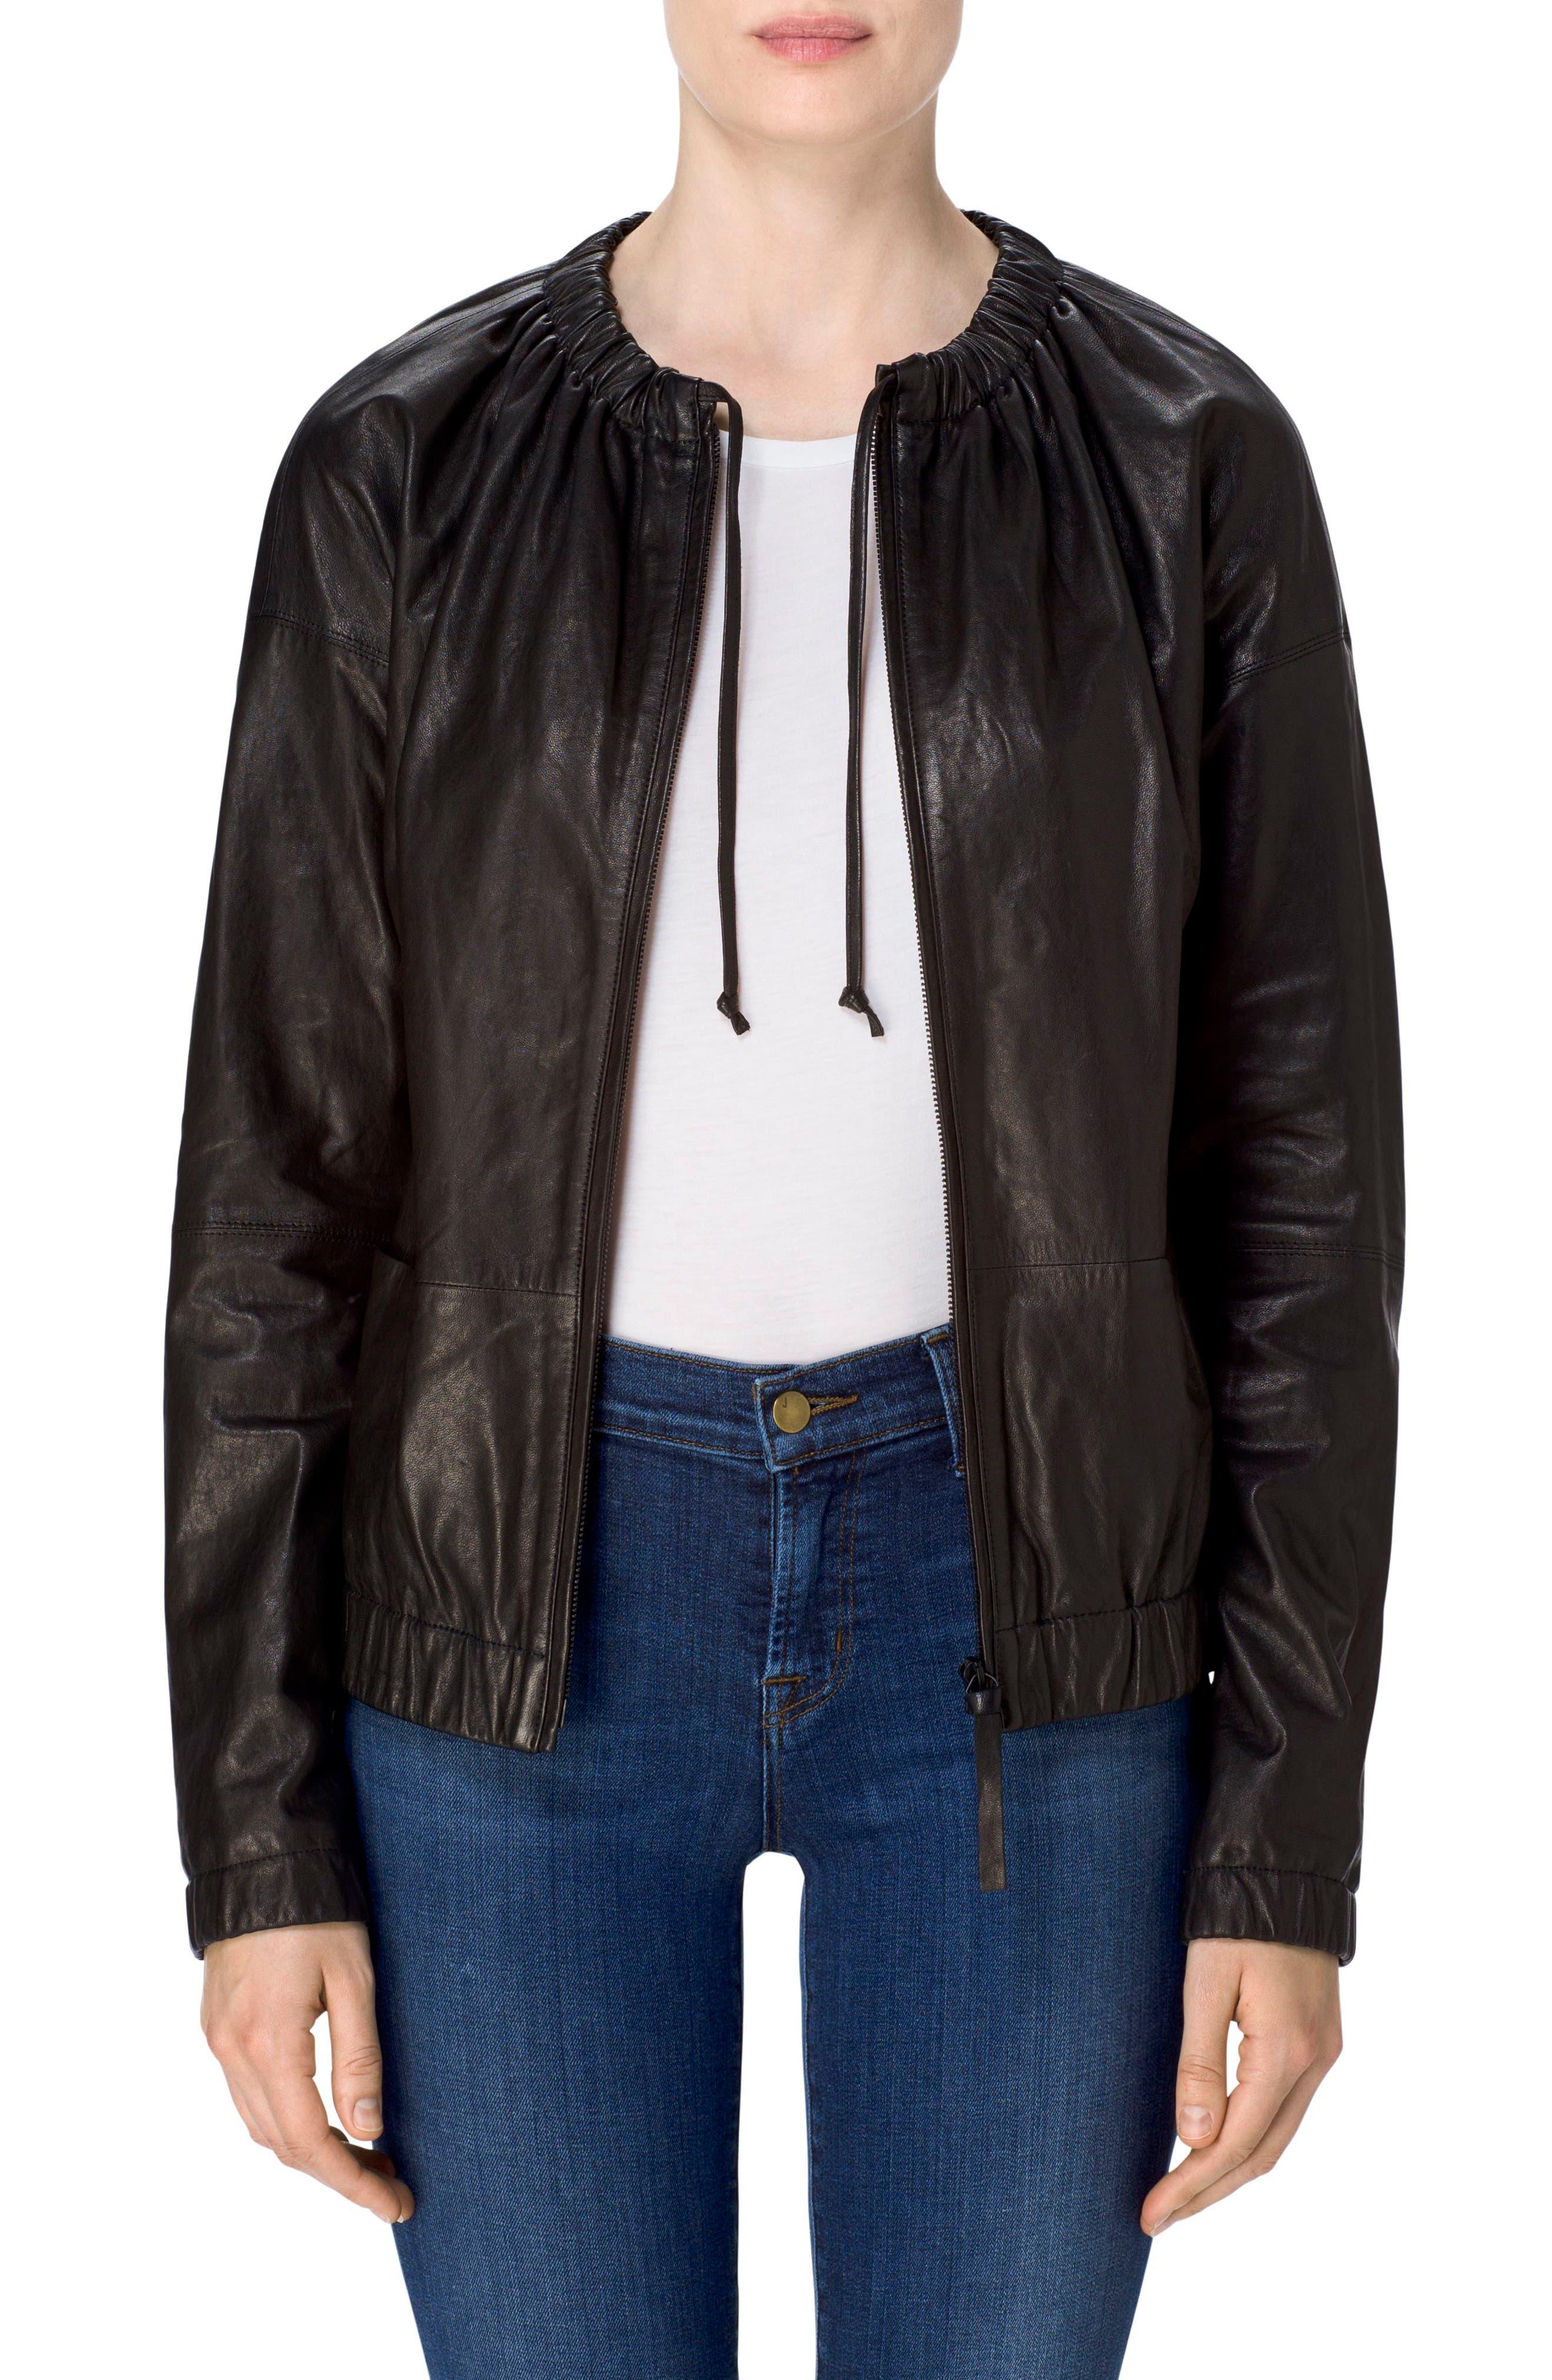 Baez Leather Bomber Jacket,                             Main thumbnail 1, color,                             Black